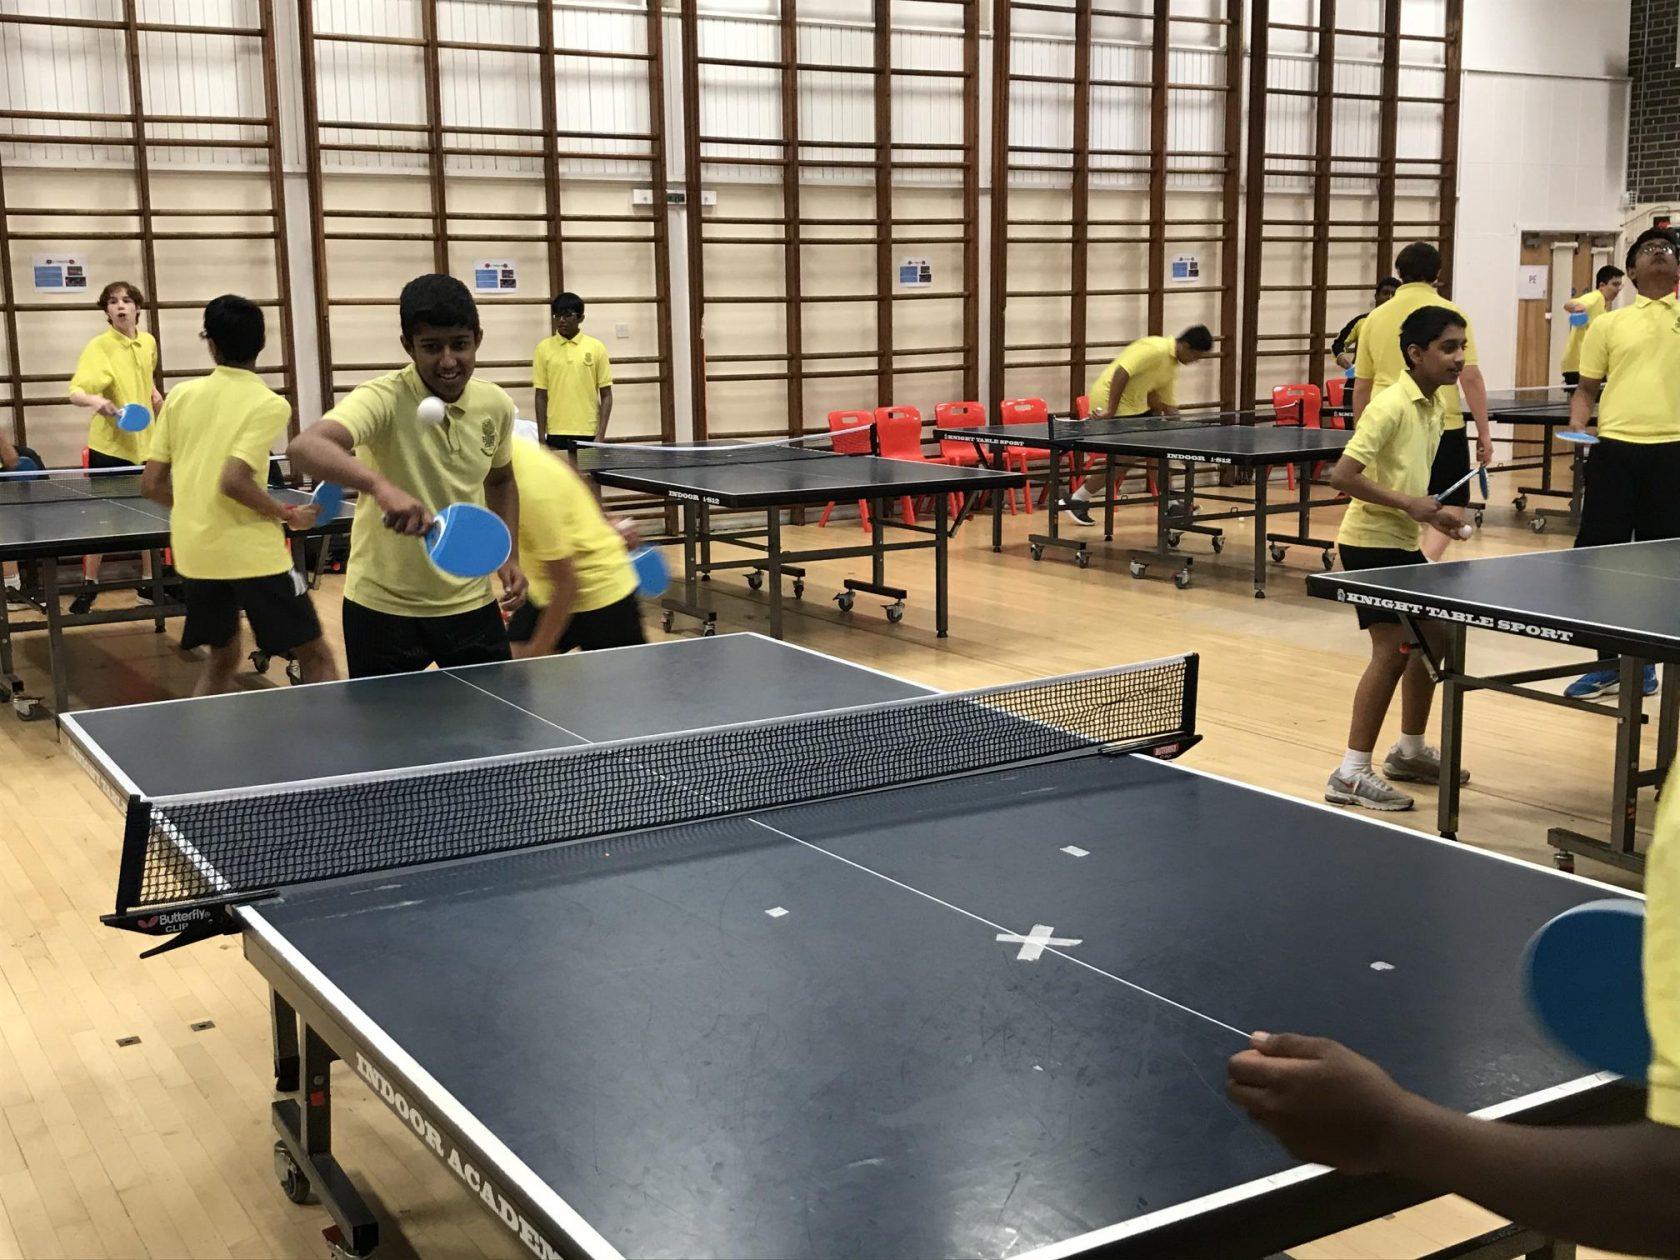 Terrific Table Tennis